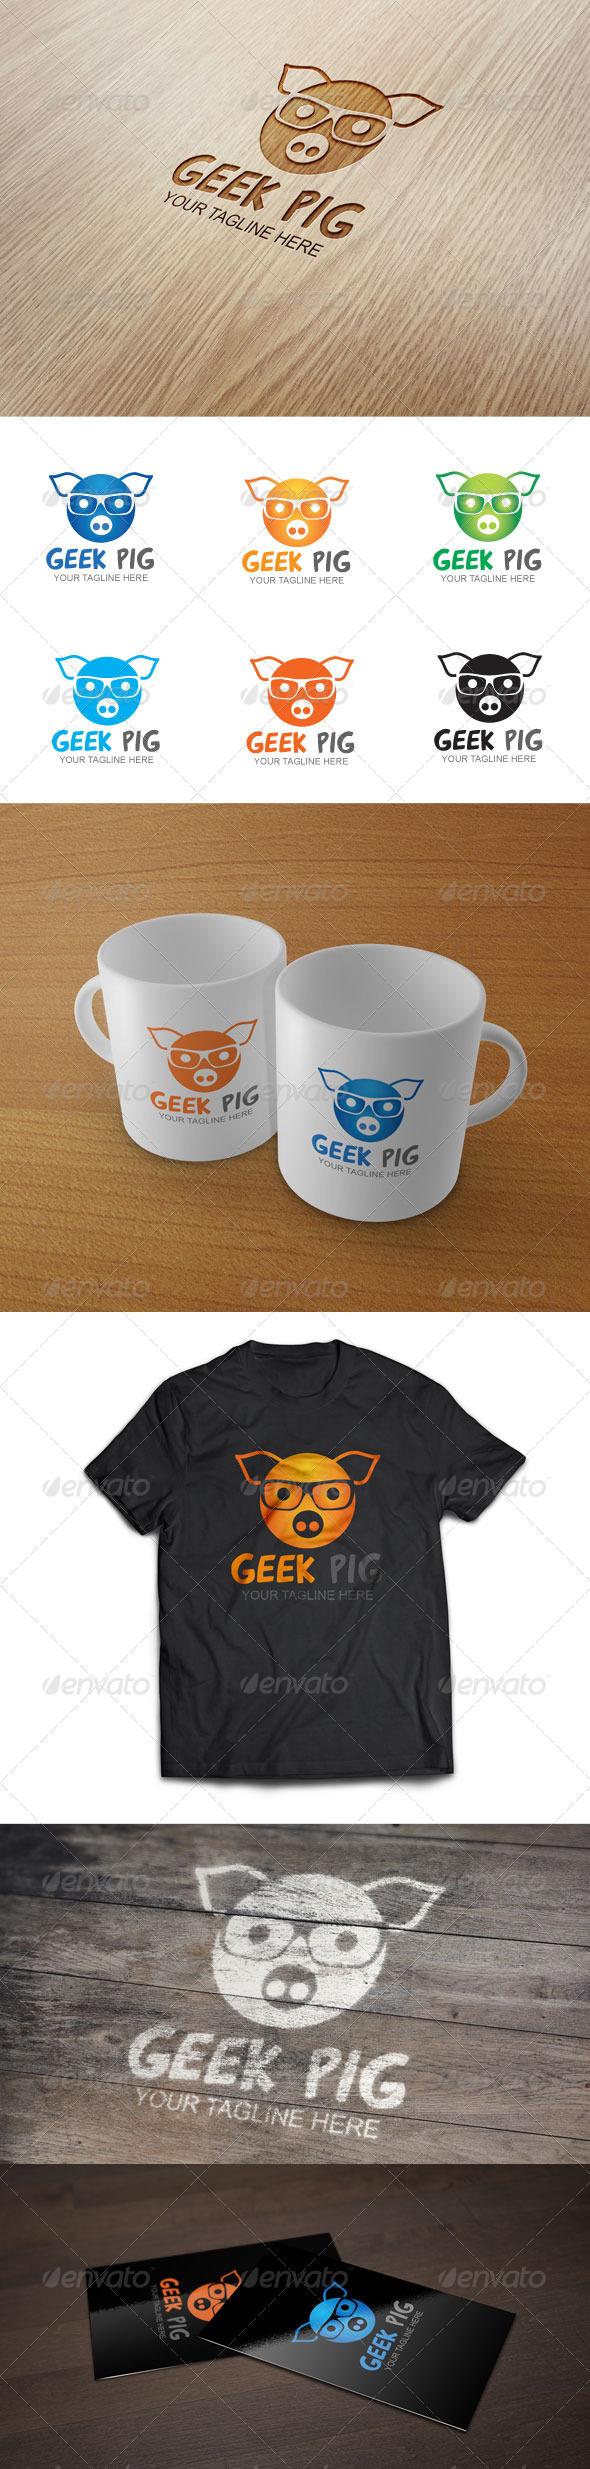 Geek Pig - Logo Template  - Animals Logo Templates